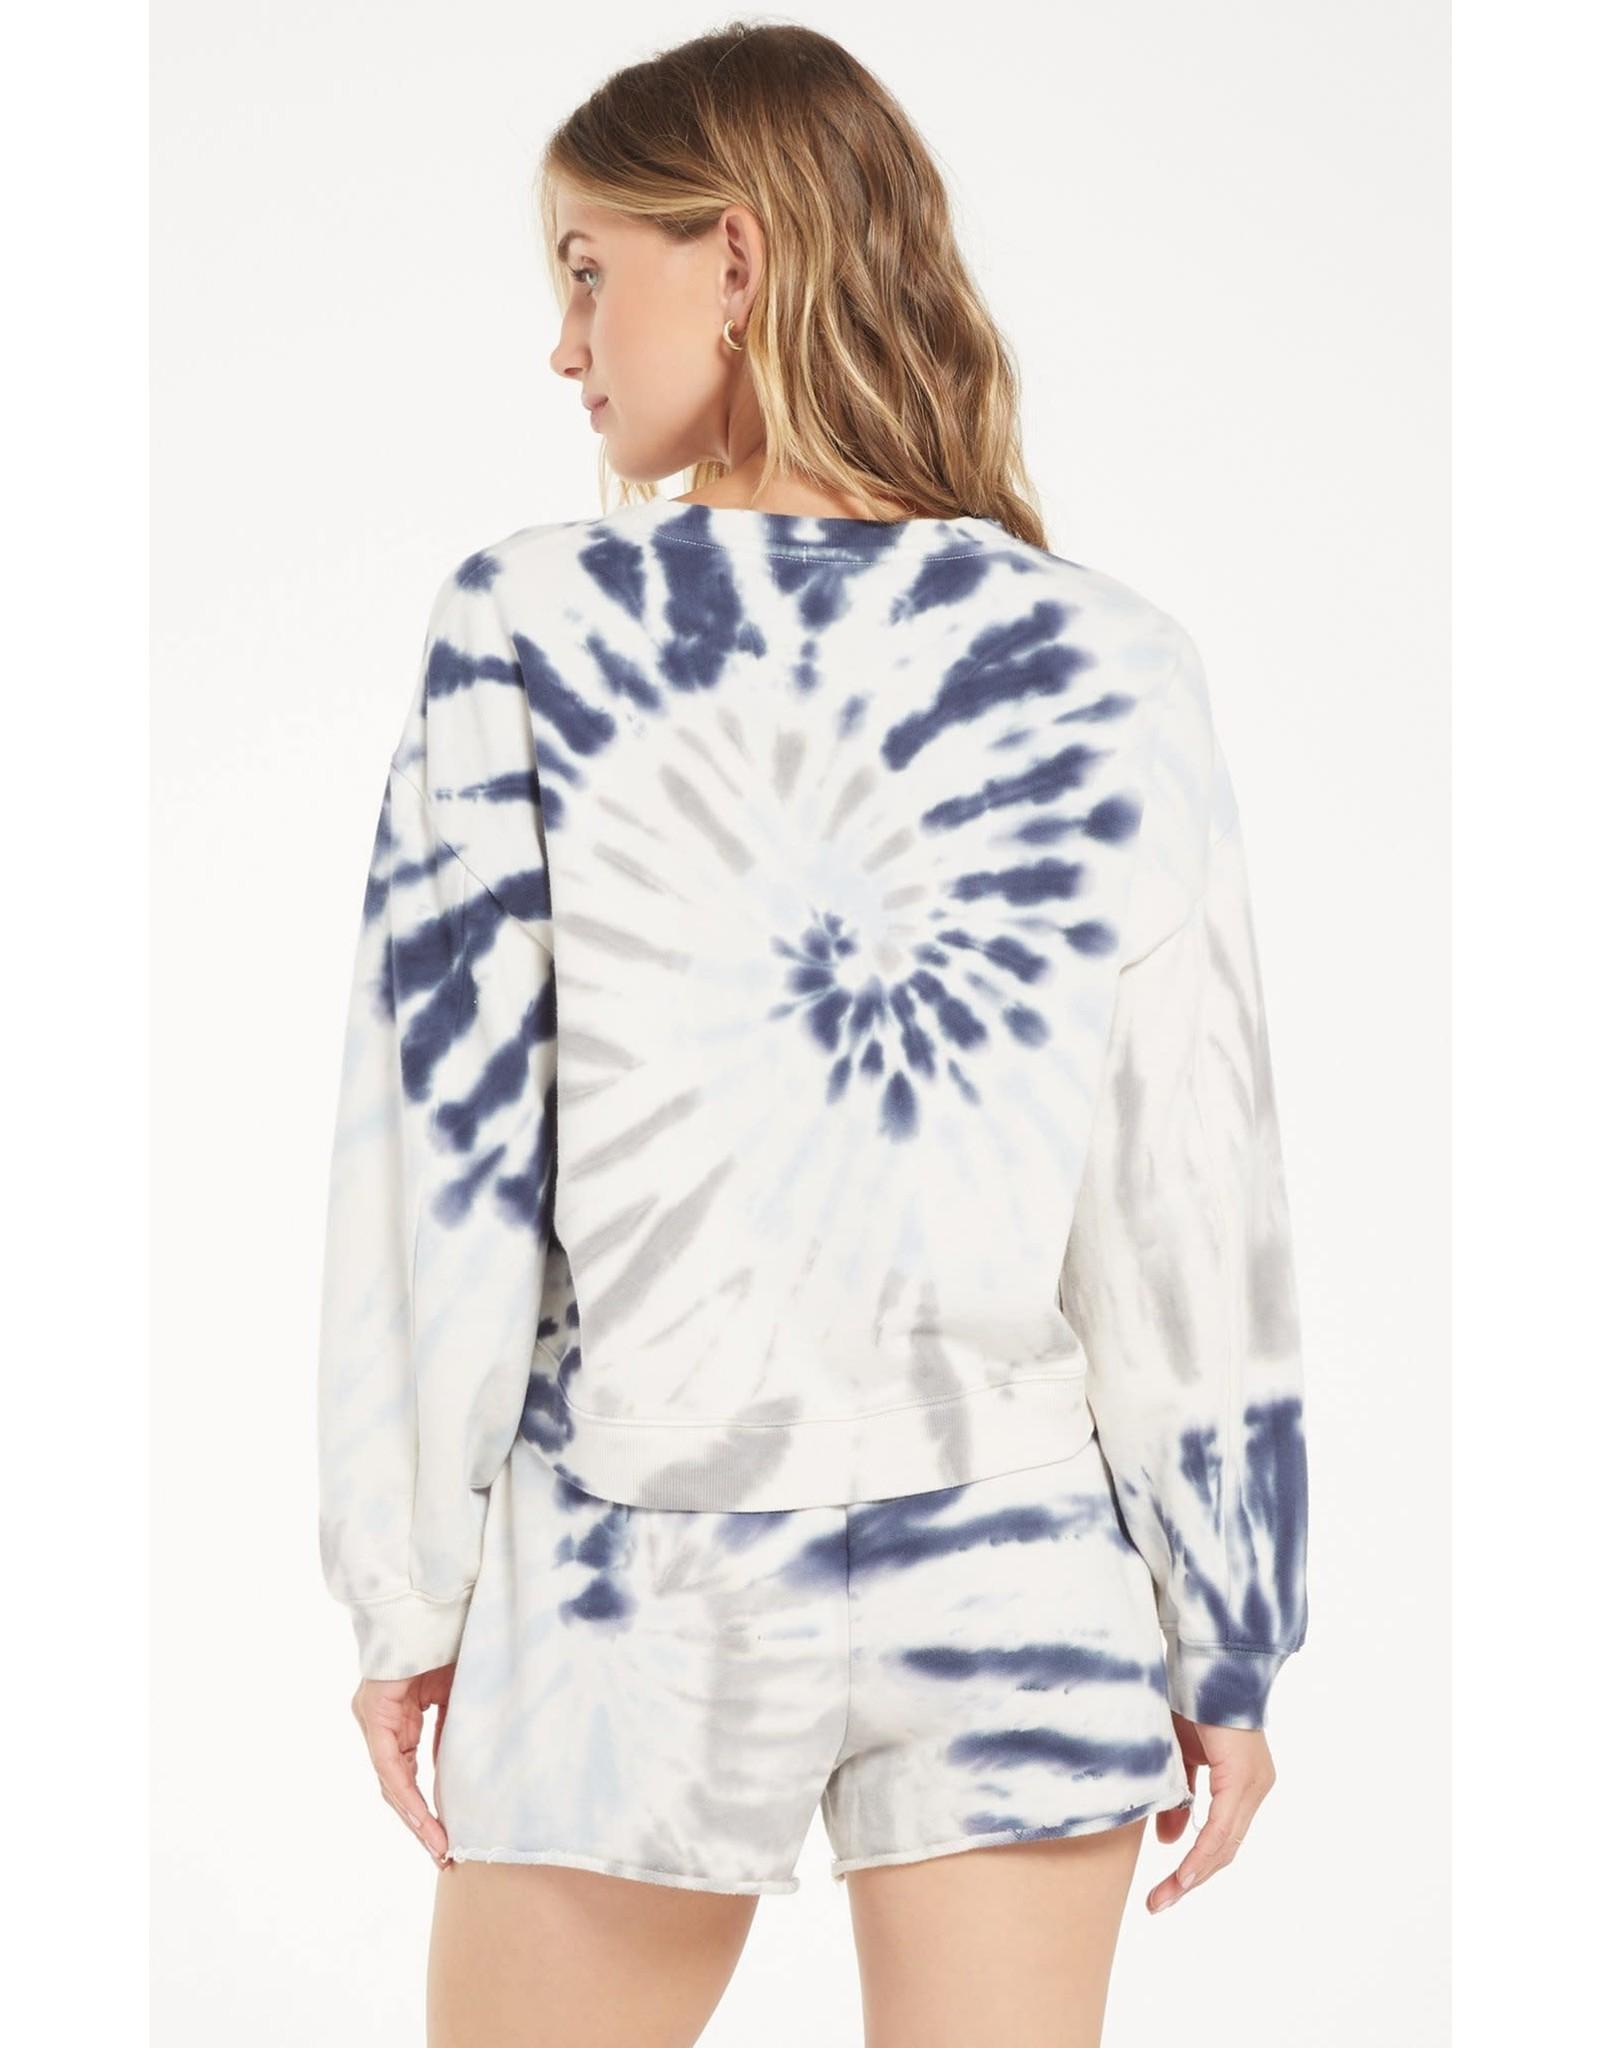 Z Supply The Multi Color Tie Dye Pullover